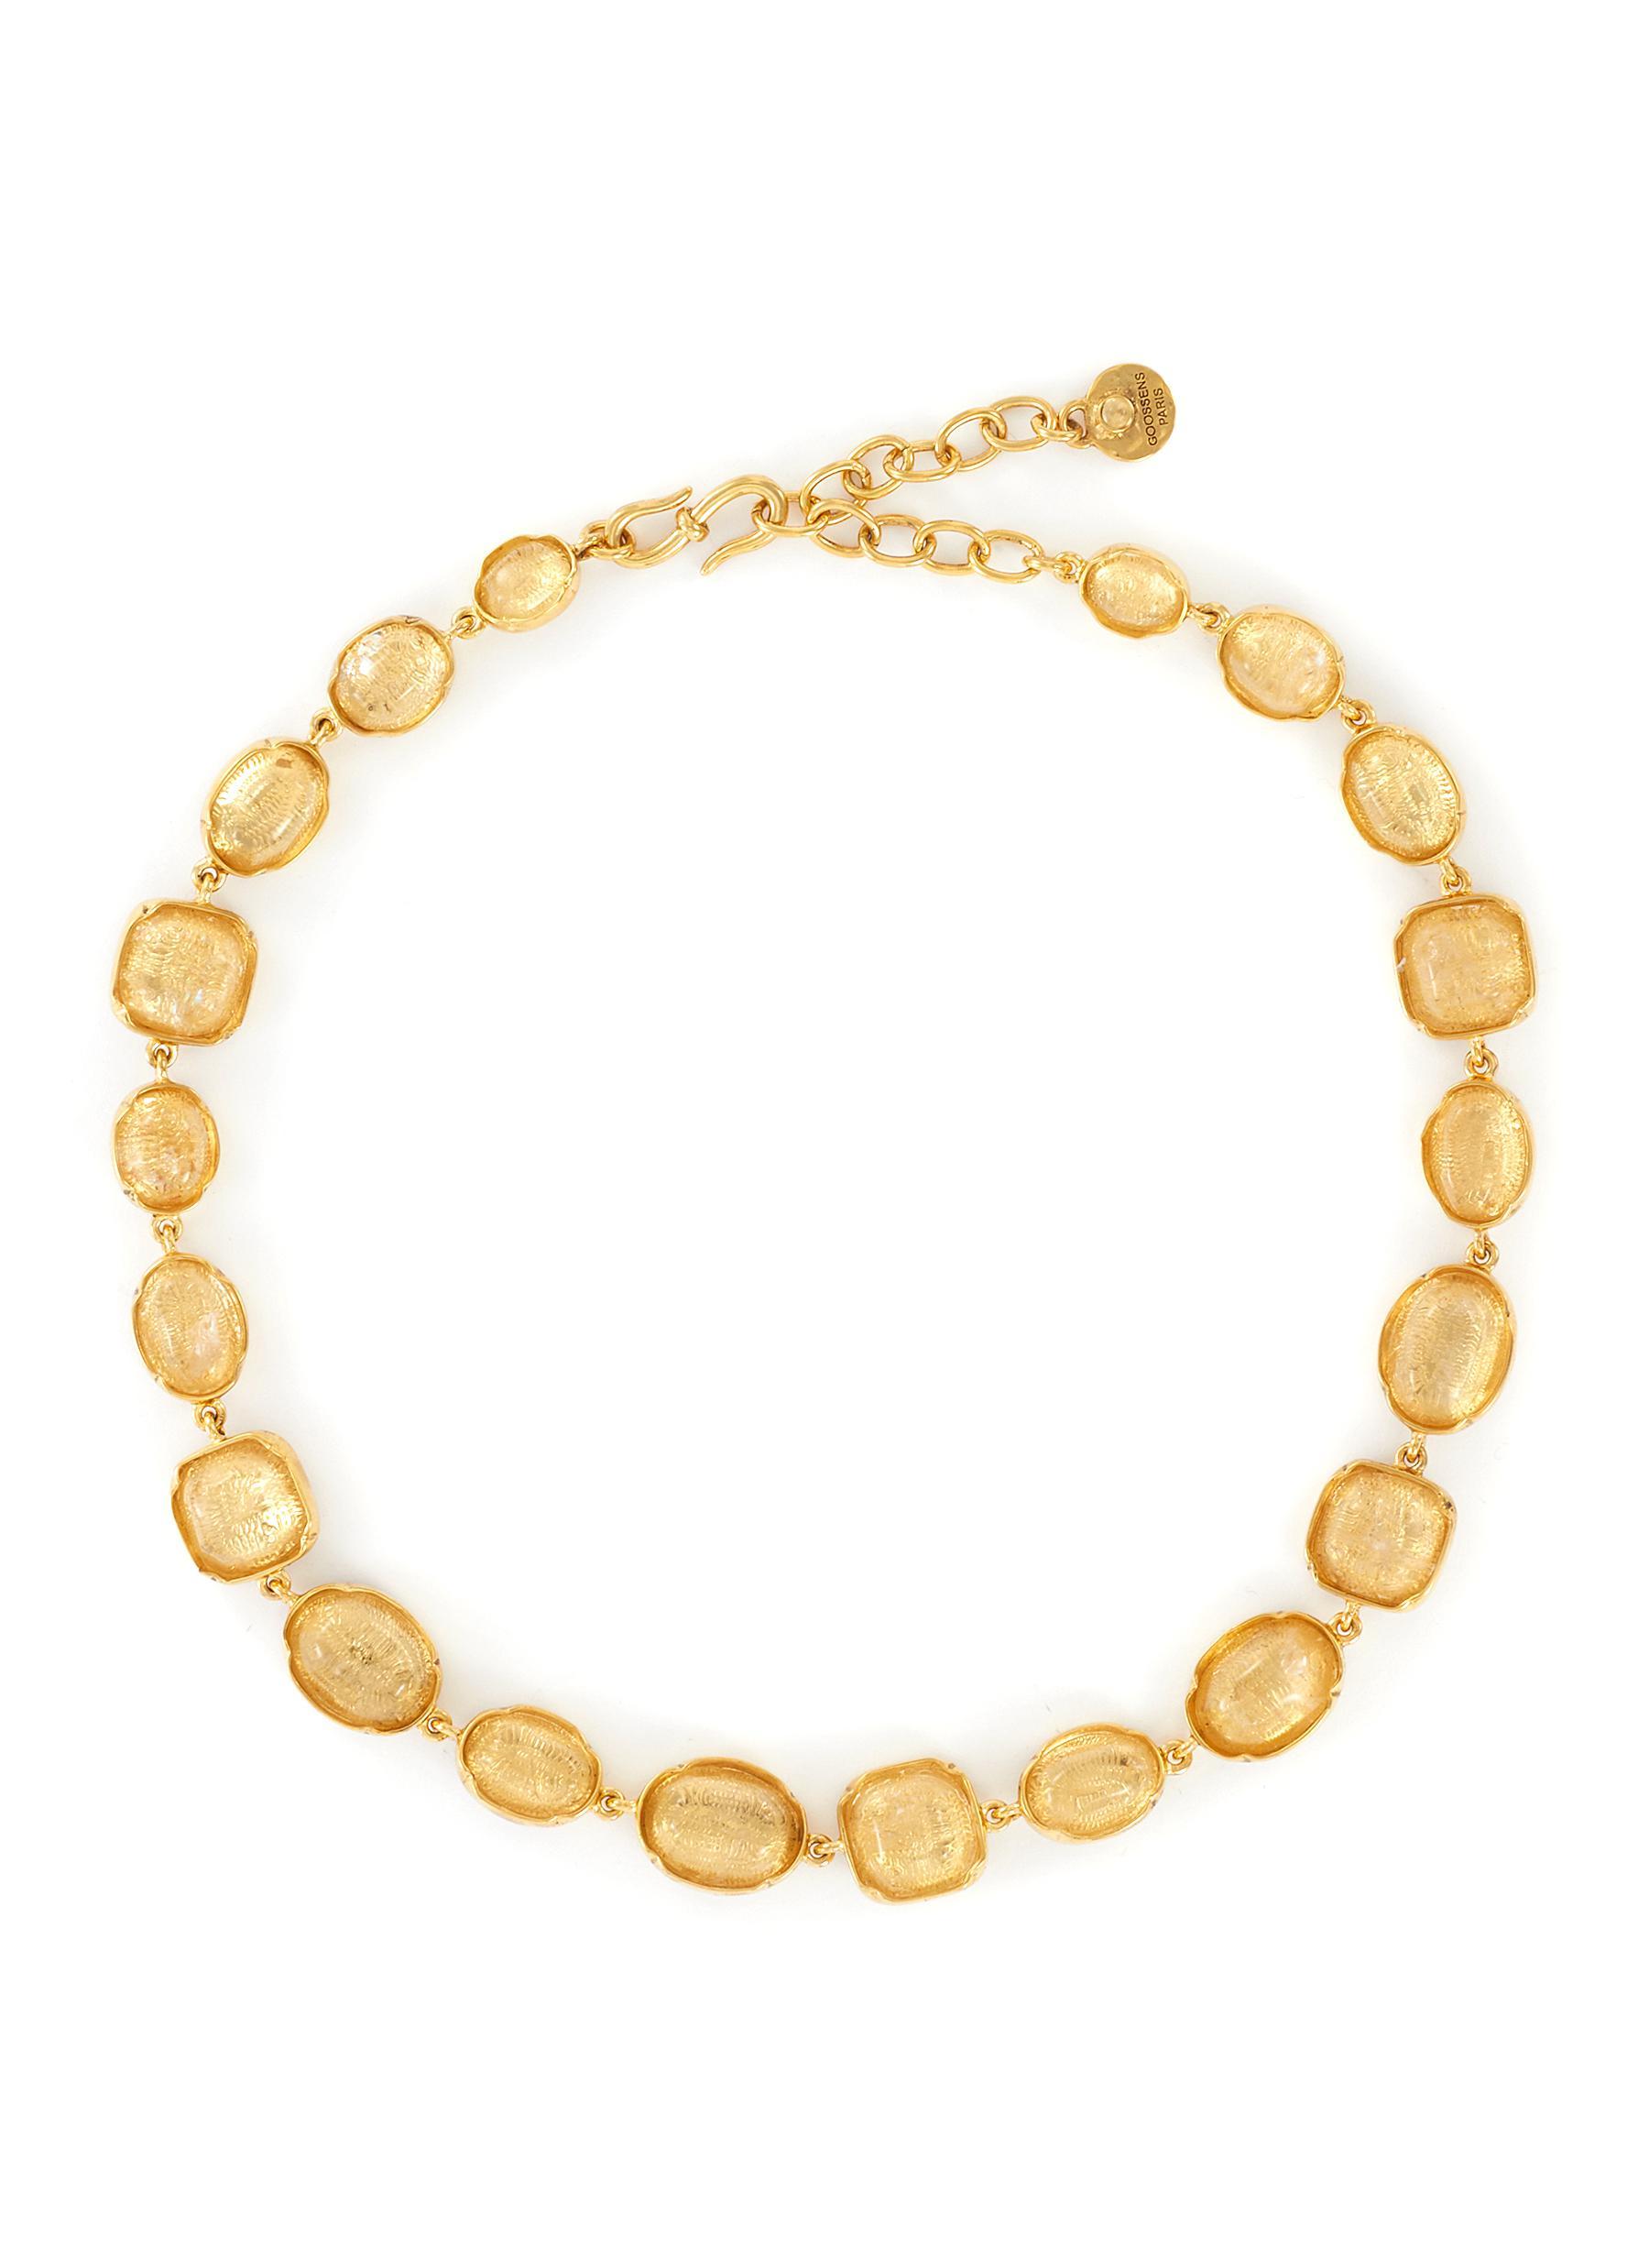 Cabochon charm necklace